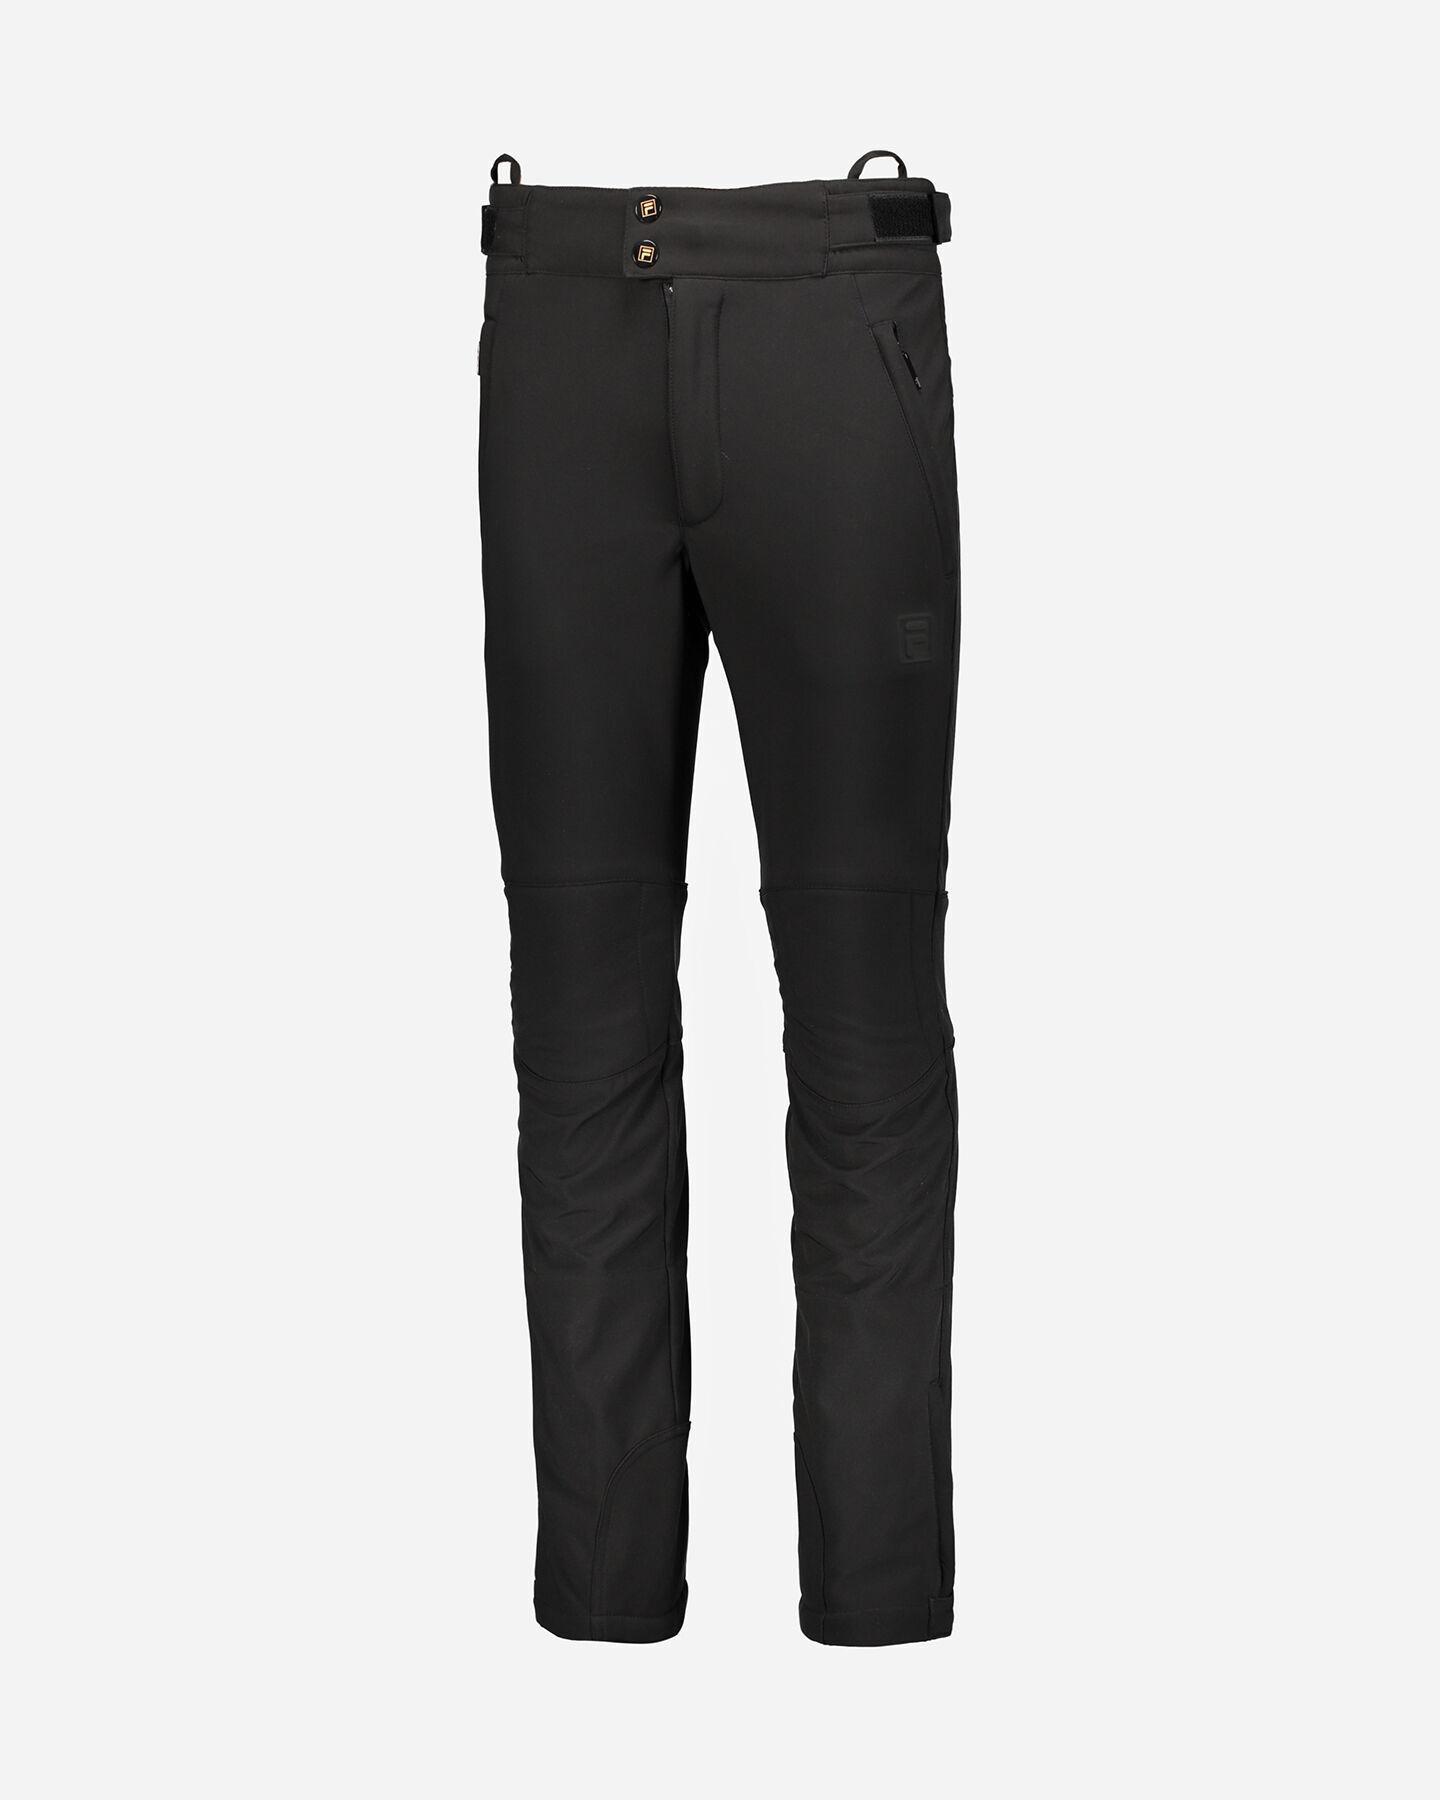 Pantalone sci FILA SKI SS PANTS M S4034199 scatto 4